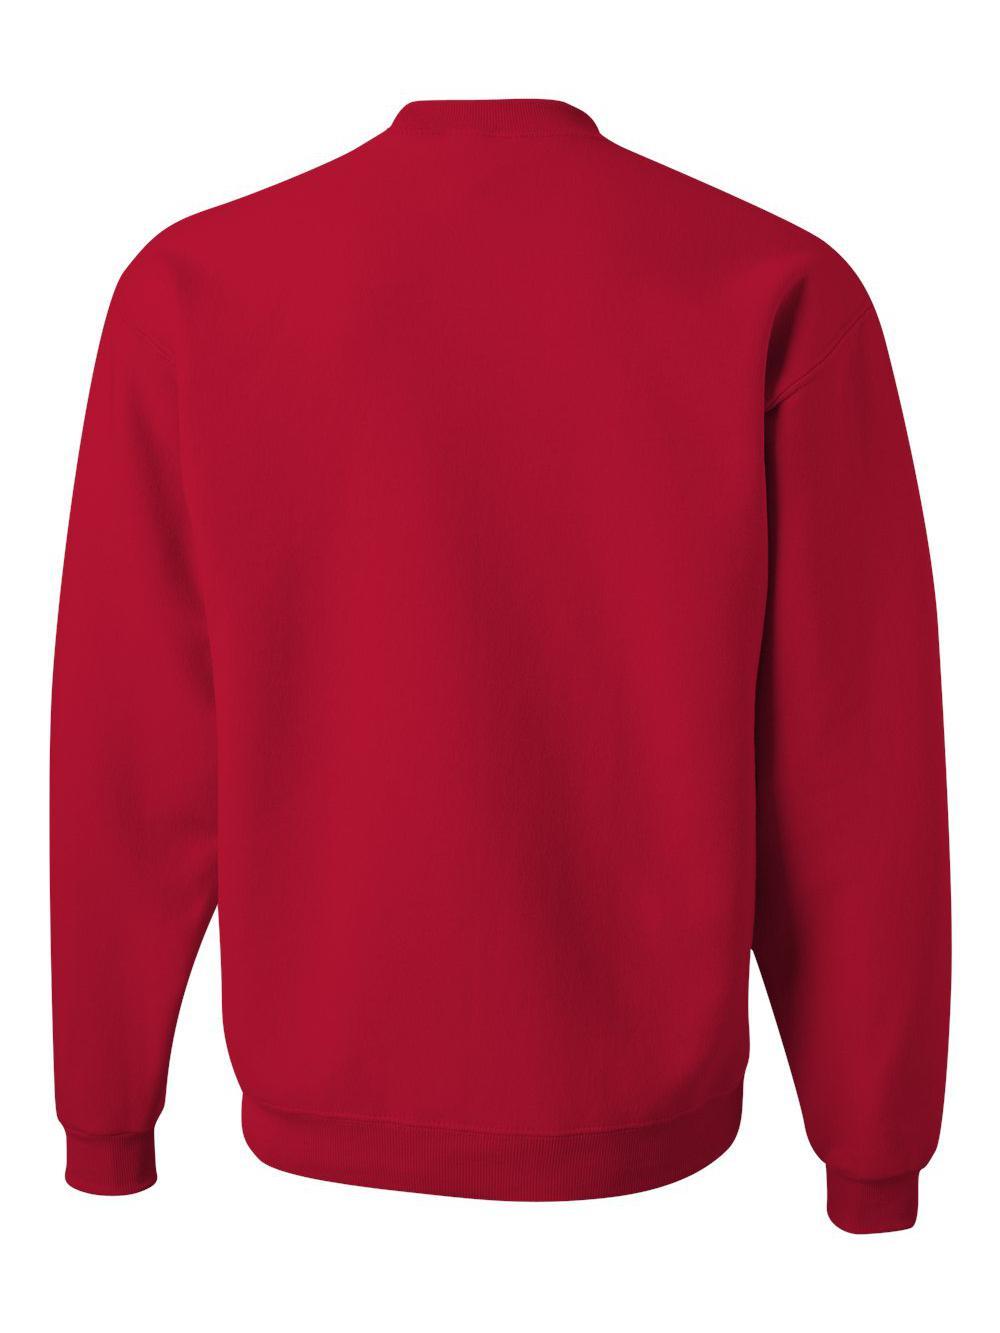 Jerzees-NuBlend-Crewneck-Sweatshirt-562MR thumbnail 91